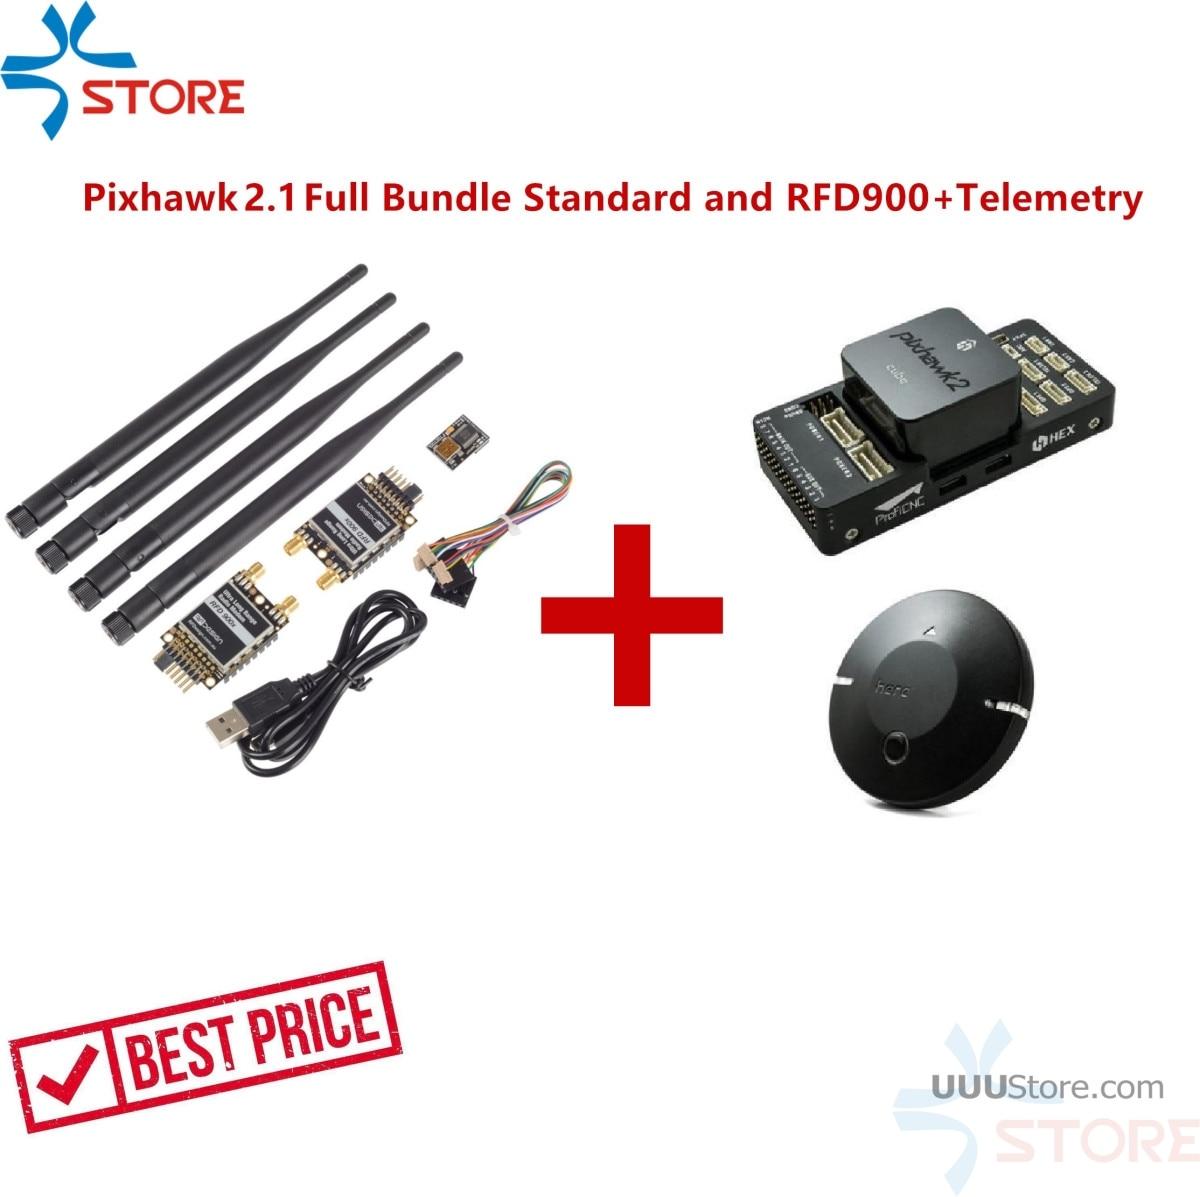 Tecnología hexagonal Pixhawk 2,1 paquete completo estándar placa de transporte RFD900 + Combo de telemetría